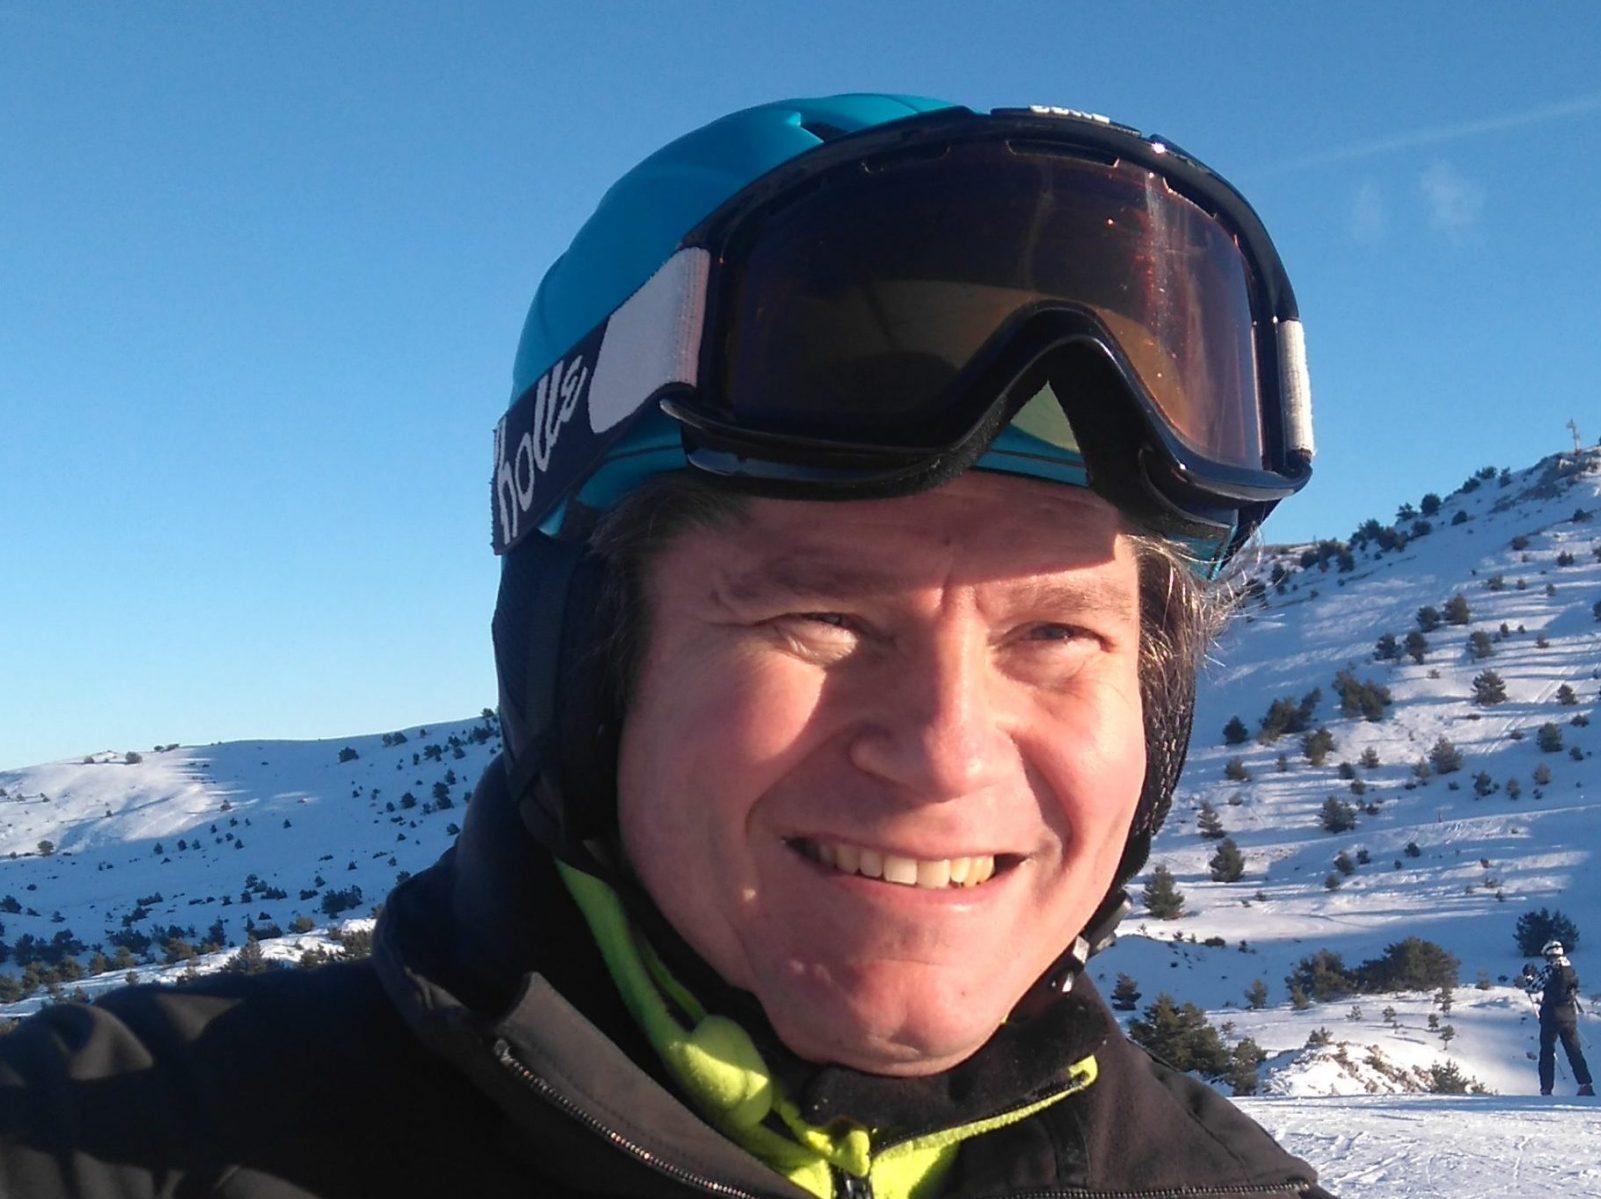 moniteur MF2 SKi Alpin et Moniteur MF1 snowbord